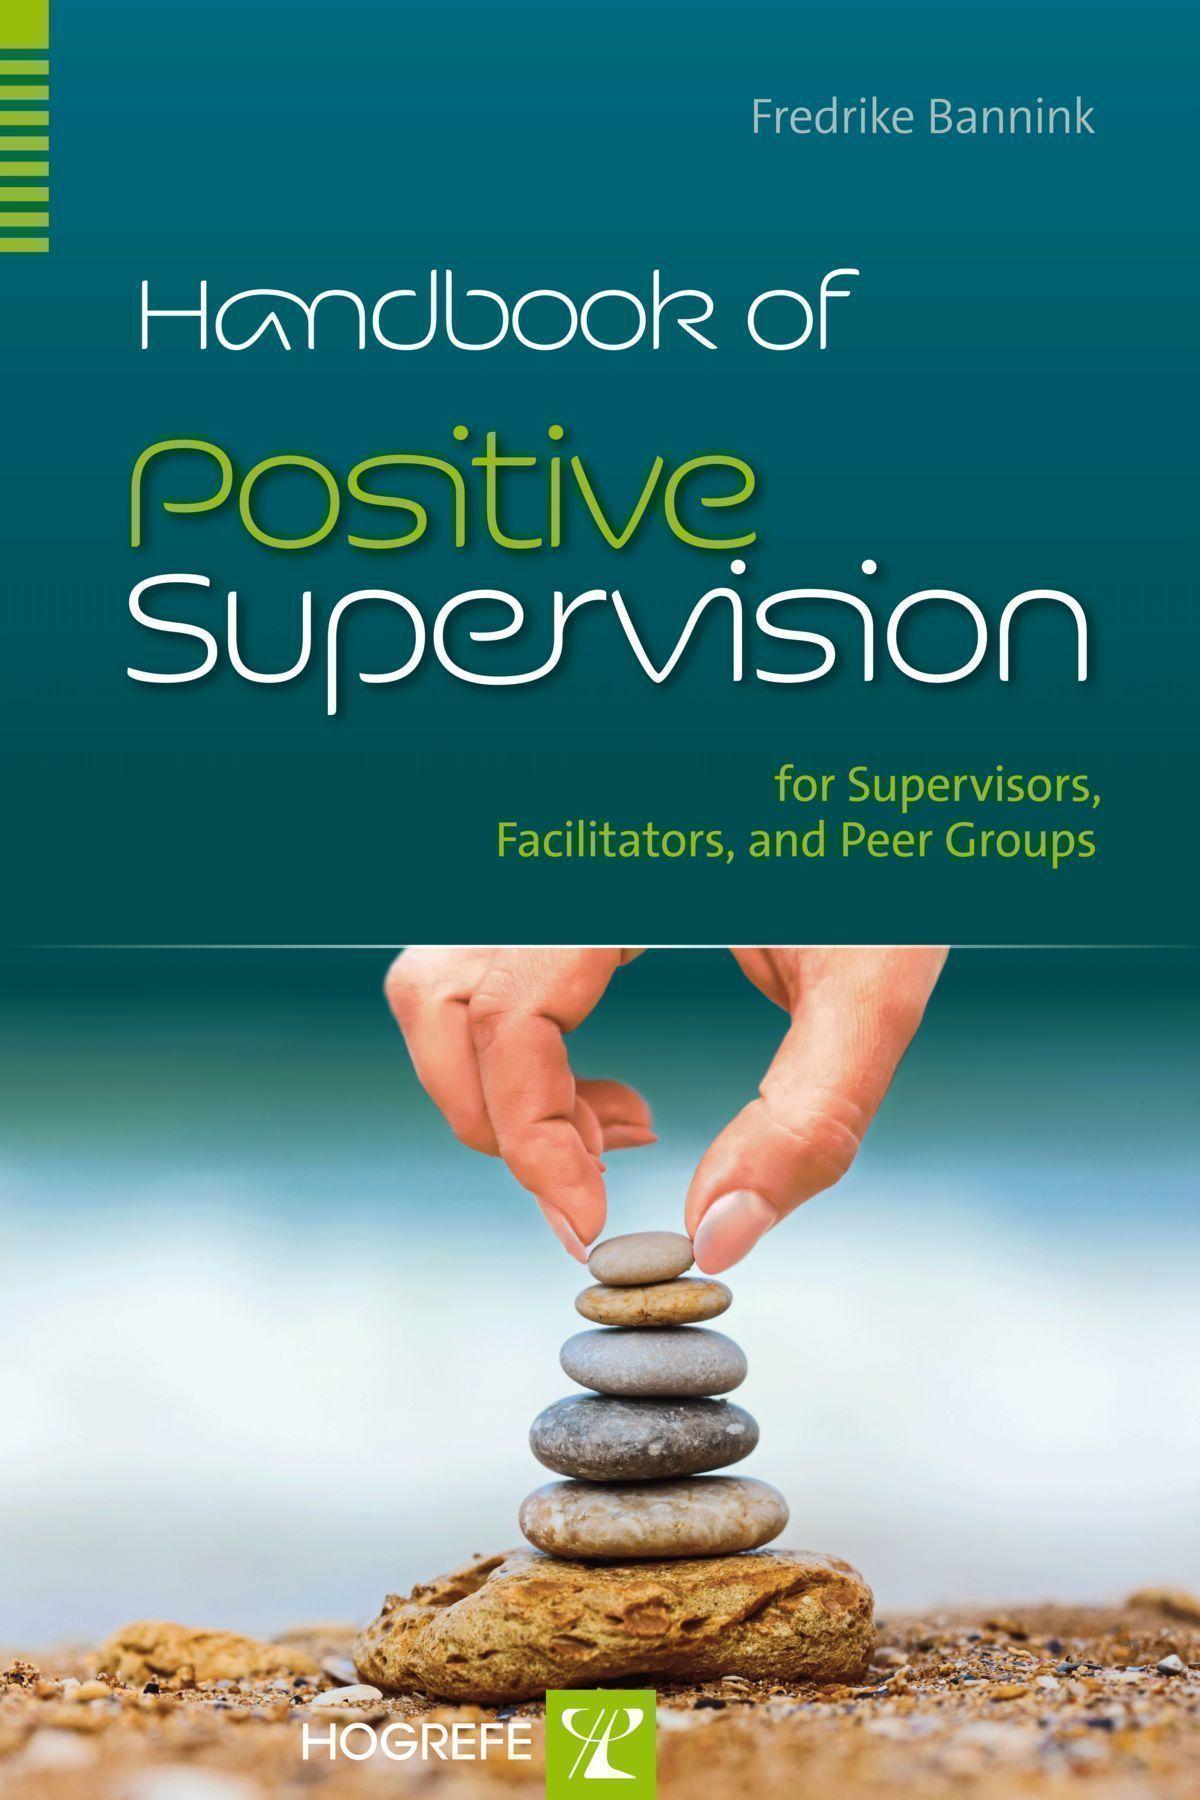 Handbook of Positive Supervision